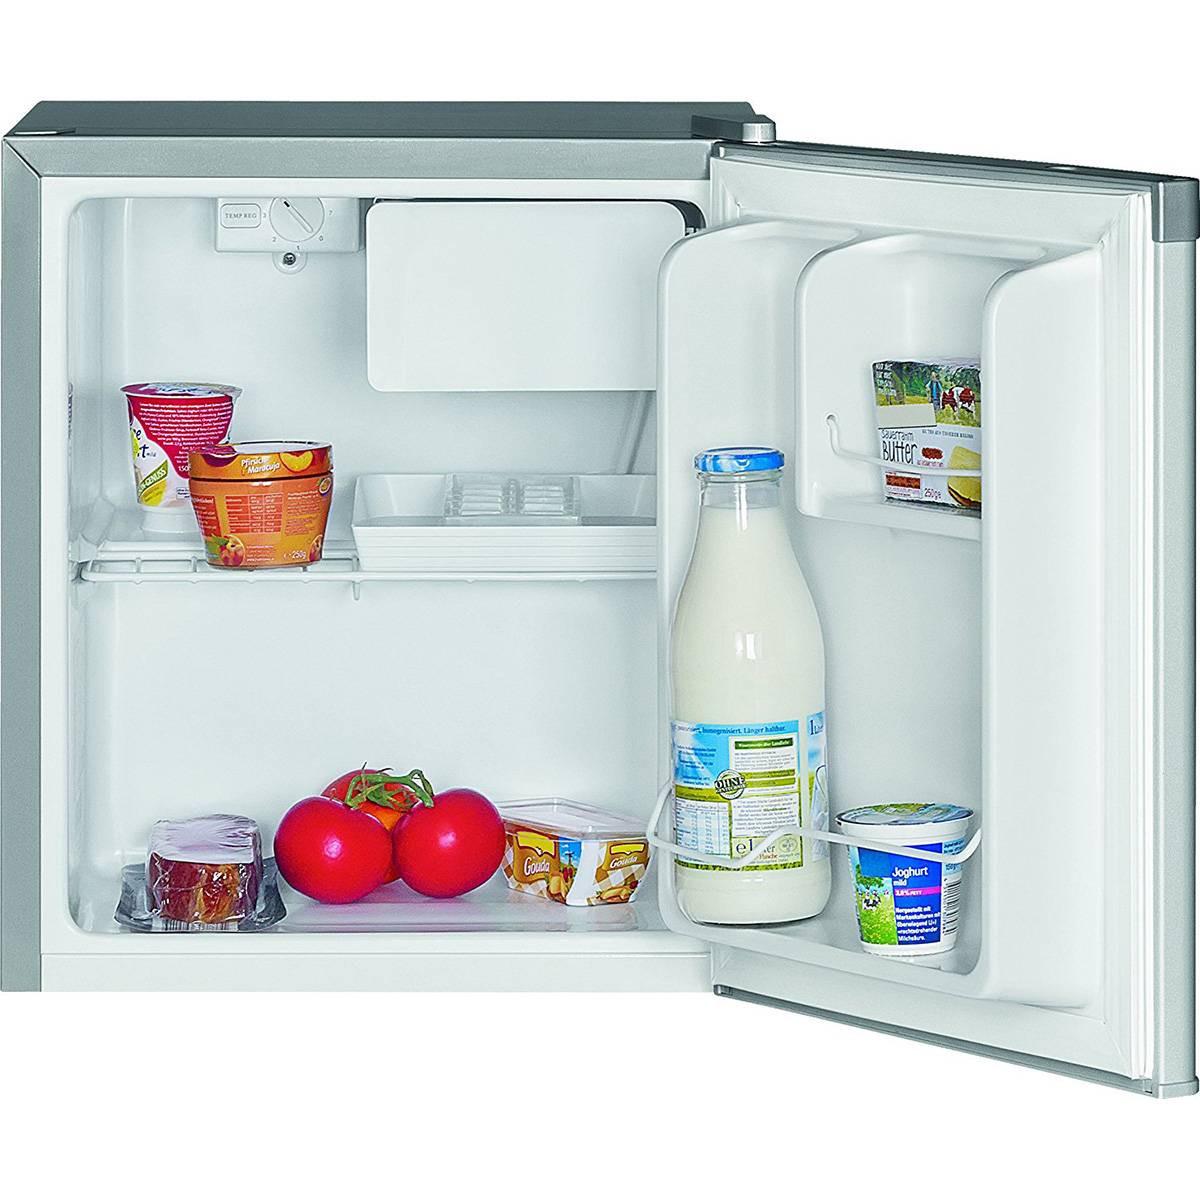 Bomann KB 389 - Mini bar nevera independiente con cogelador 42 litros, A++ , color plata